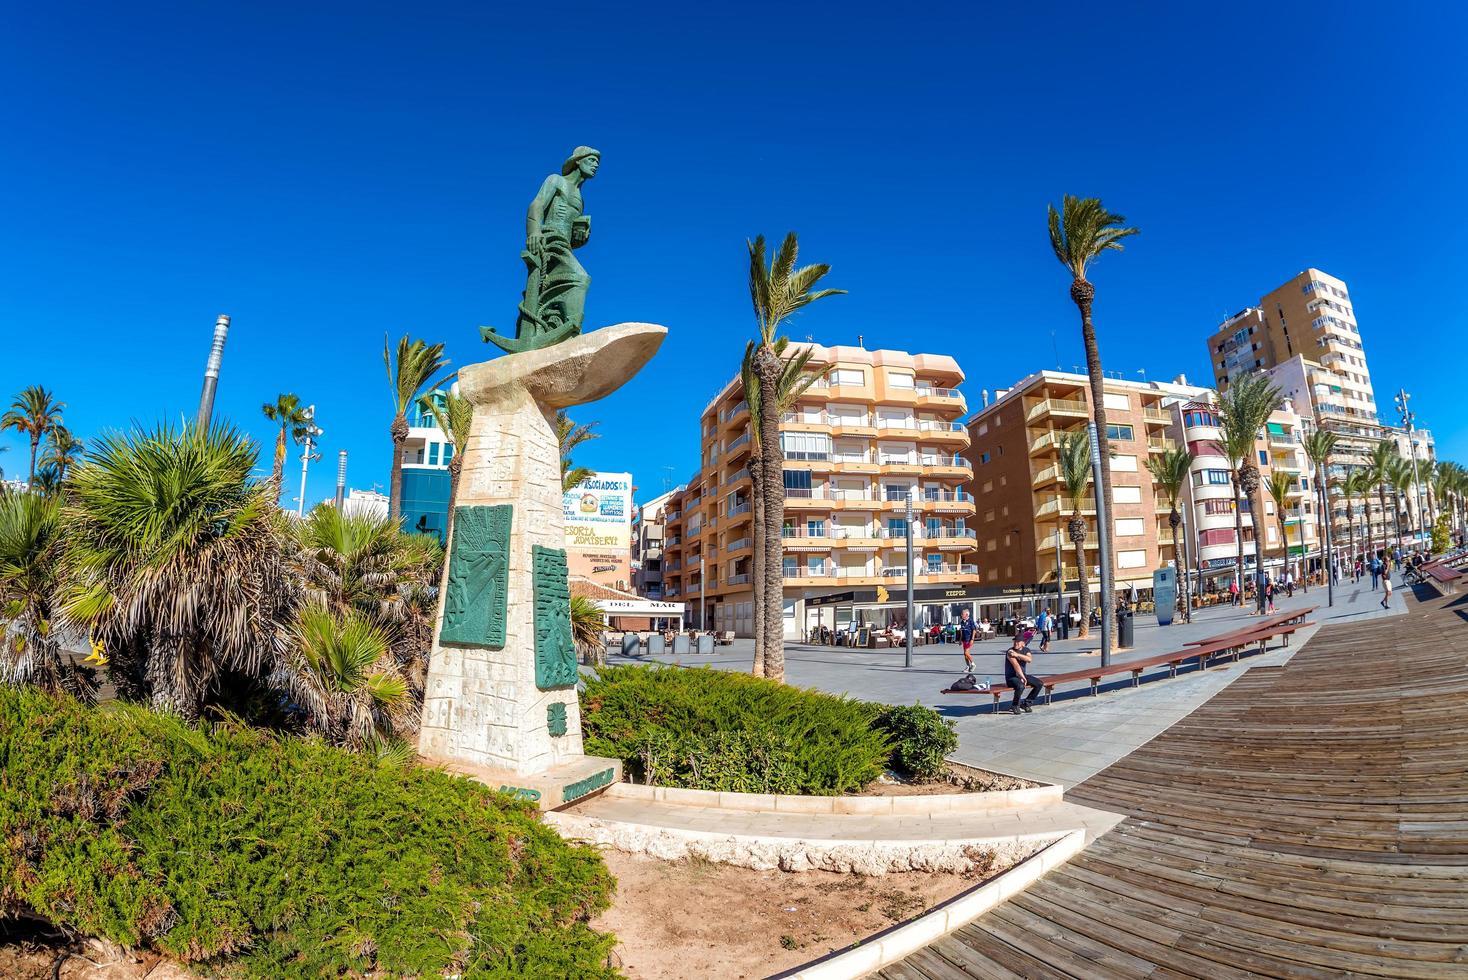 Torrevieja, españa 2017 - estatua del hombre del mar en el paseo juan aparicio foto